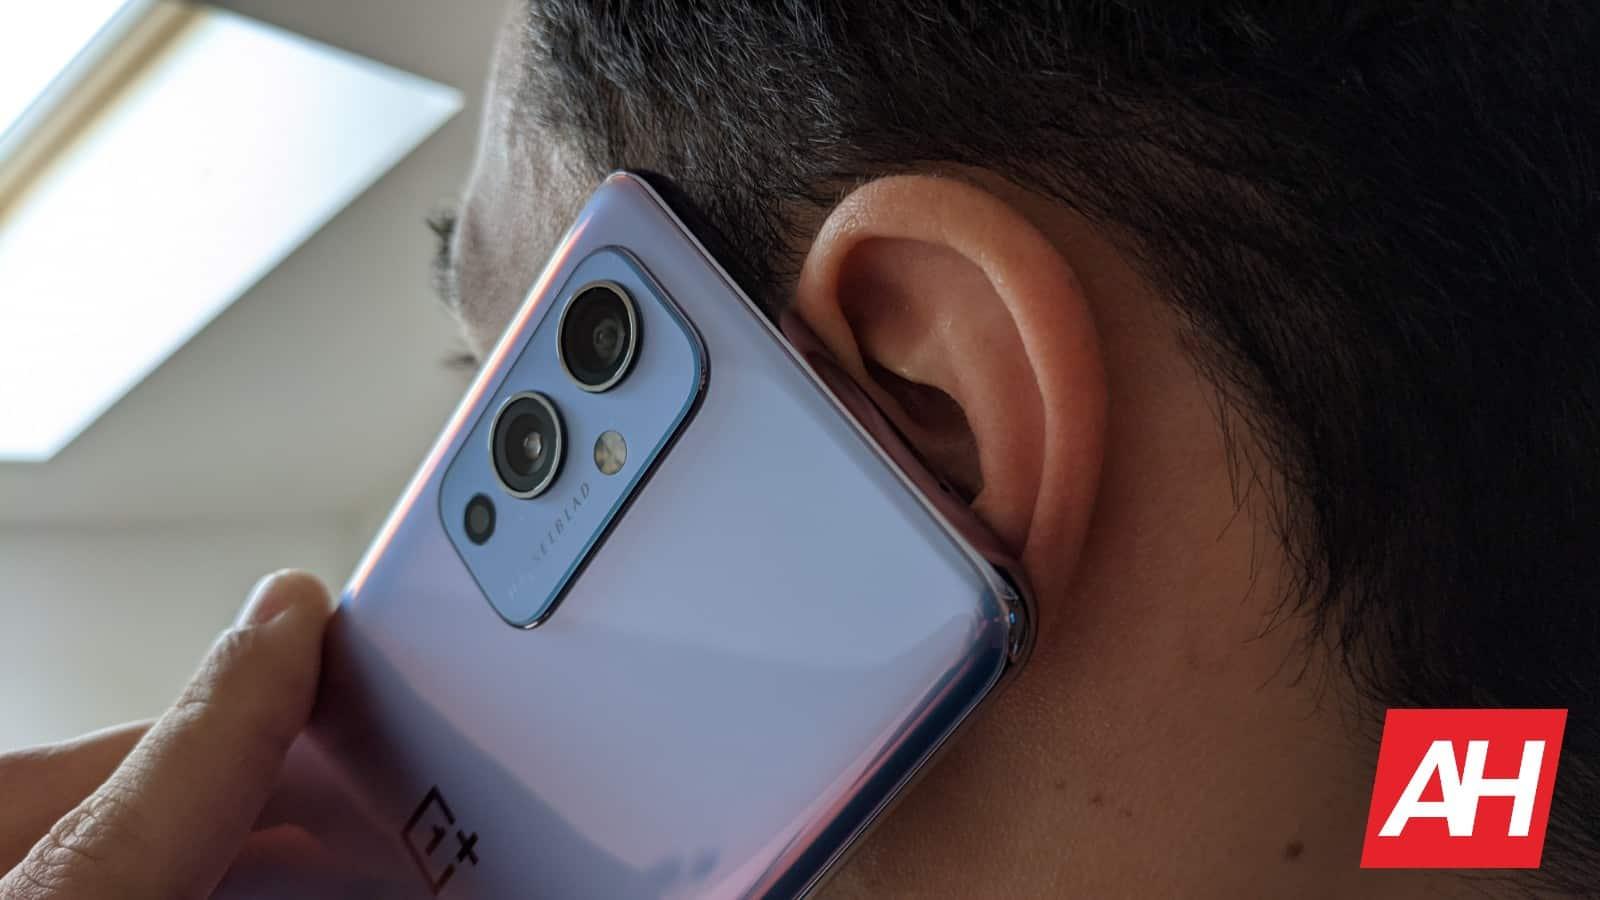 AH OnePlus 9 KL image 13